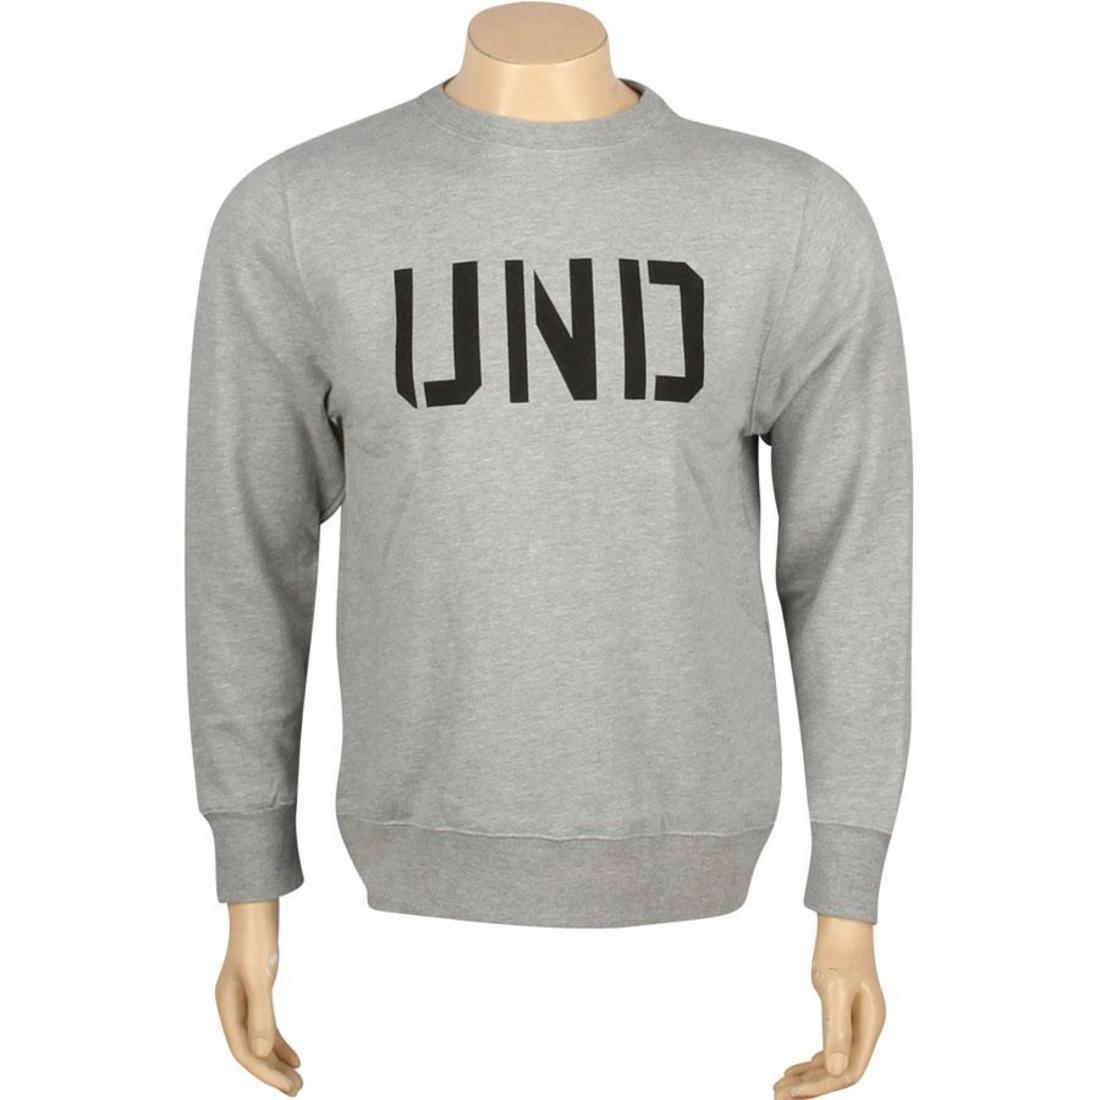 UNDEFEATED メンズファッション トップス Tシャツ カットソー メンズ 【 Und Basic Pullover Crewneck (grey Heather) 】 Grey Heather